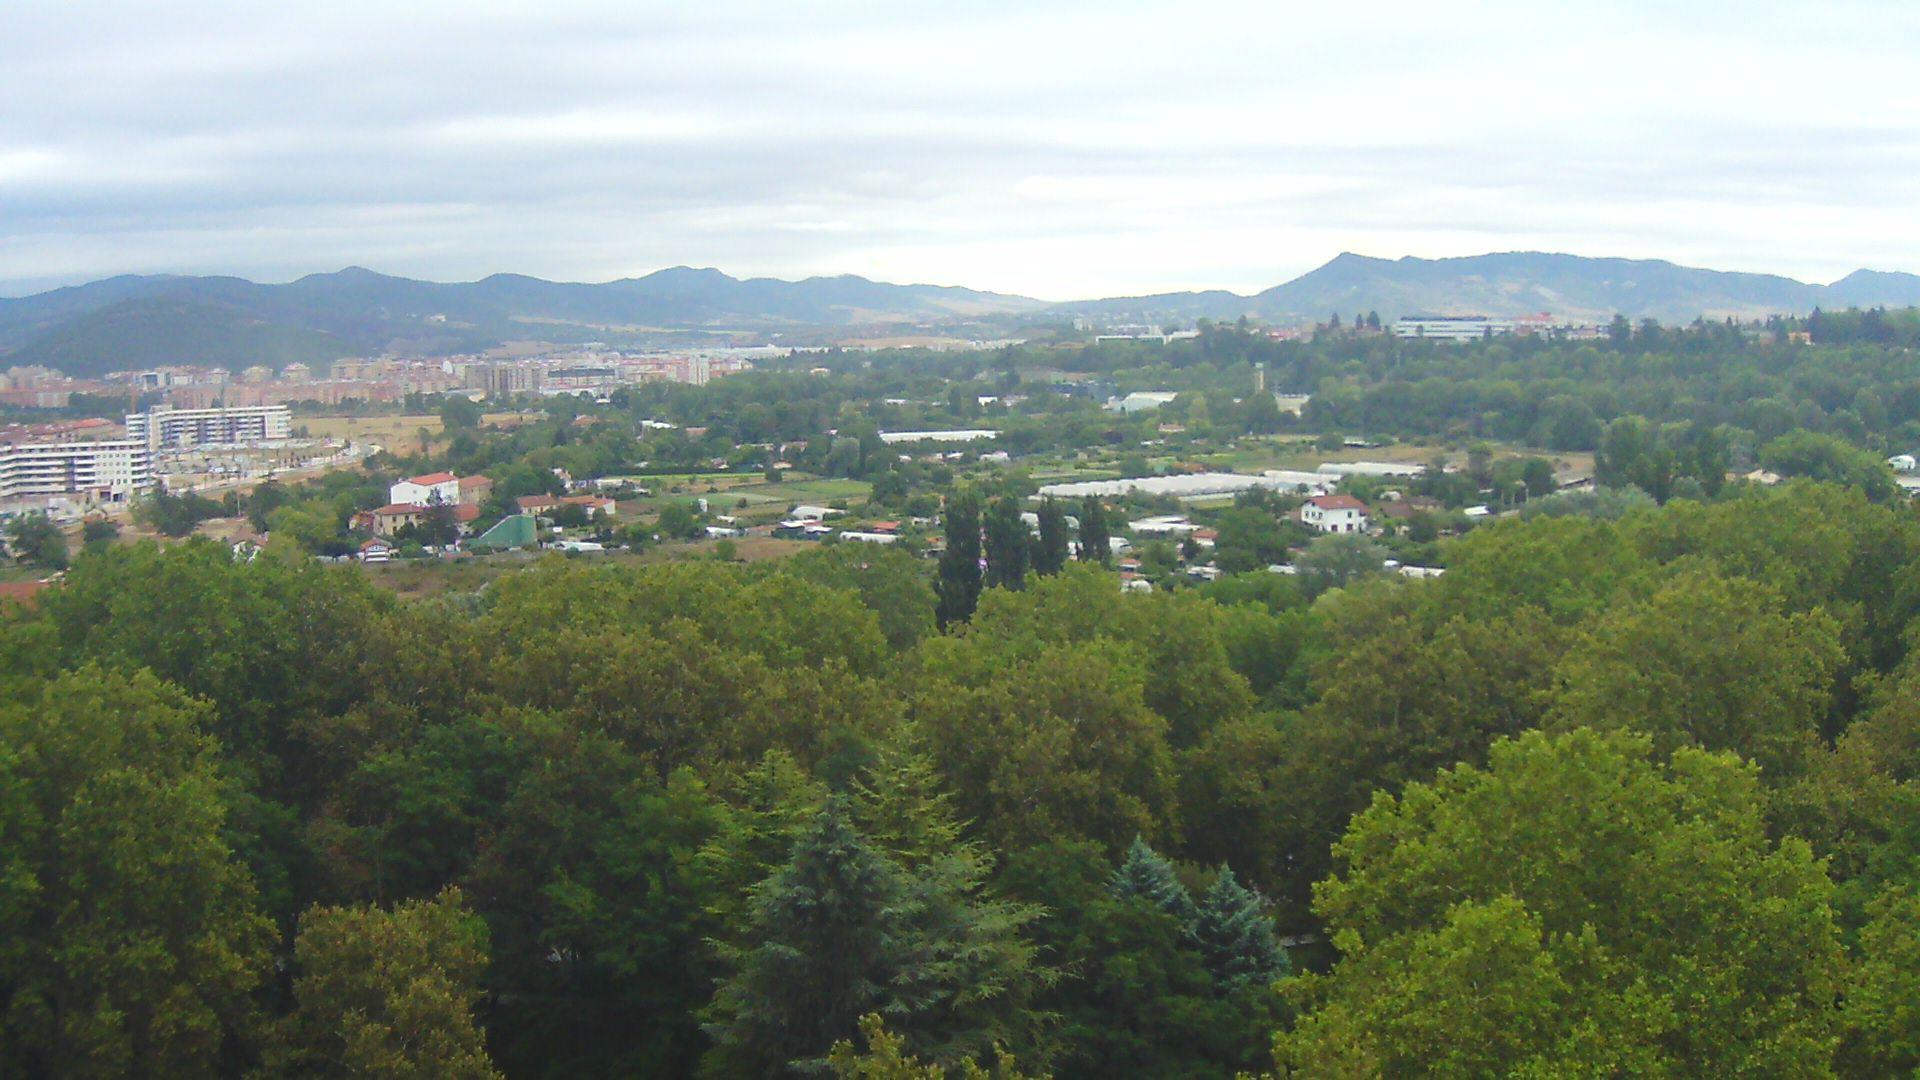 Pamplona So. 09:46